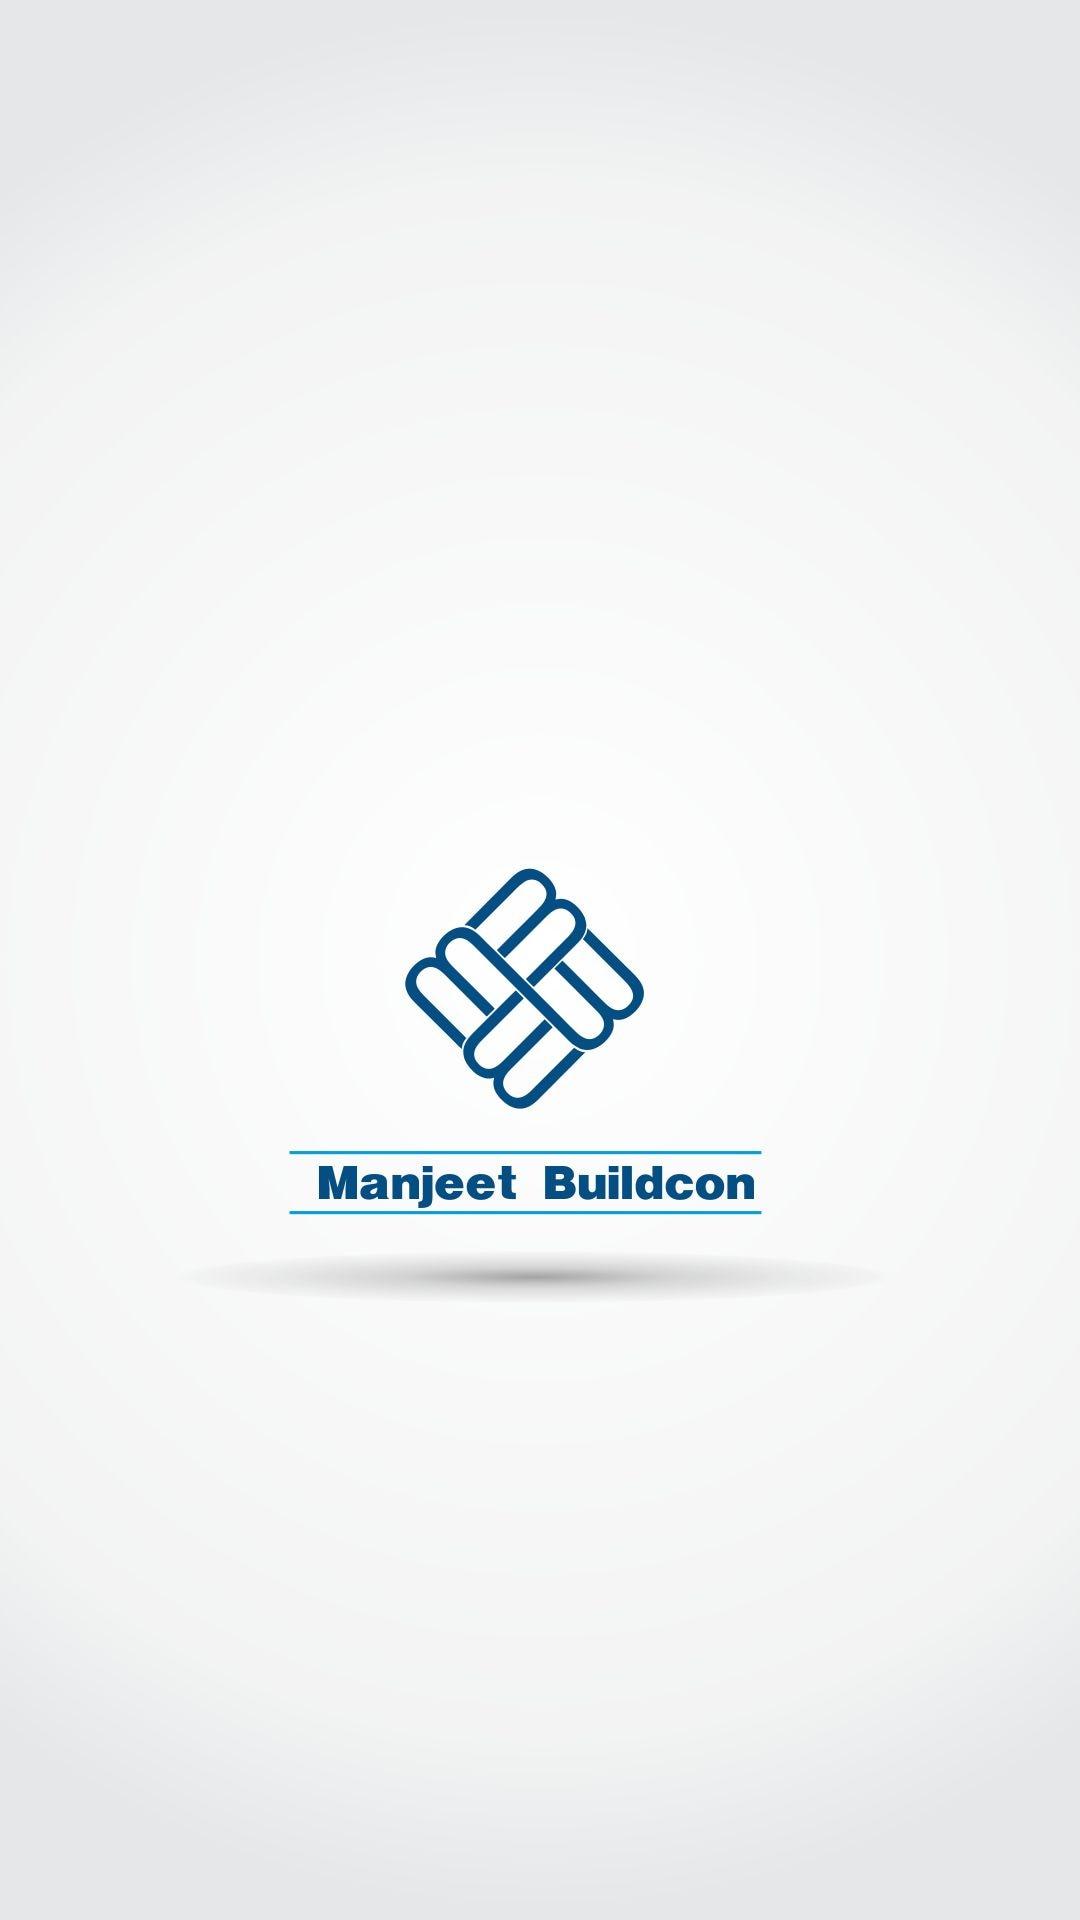 image of Manjeet Build Con